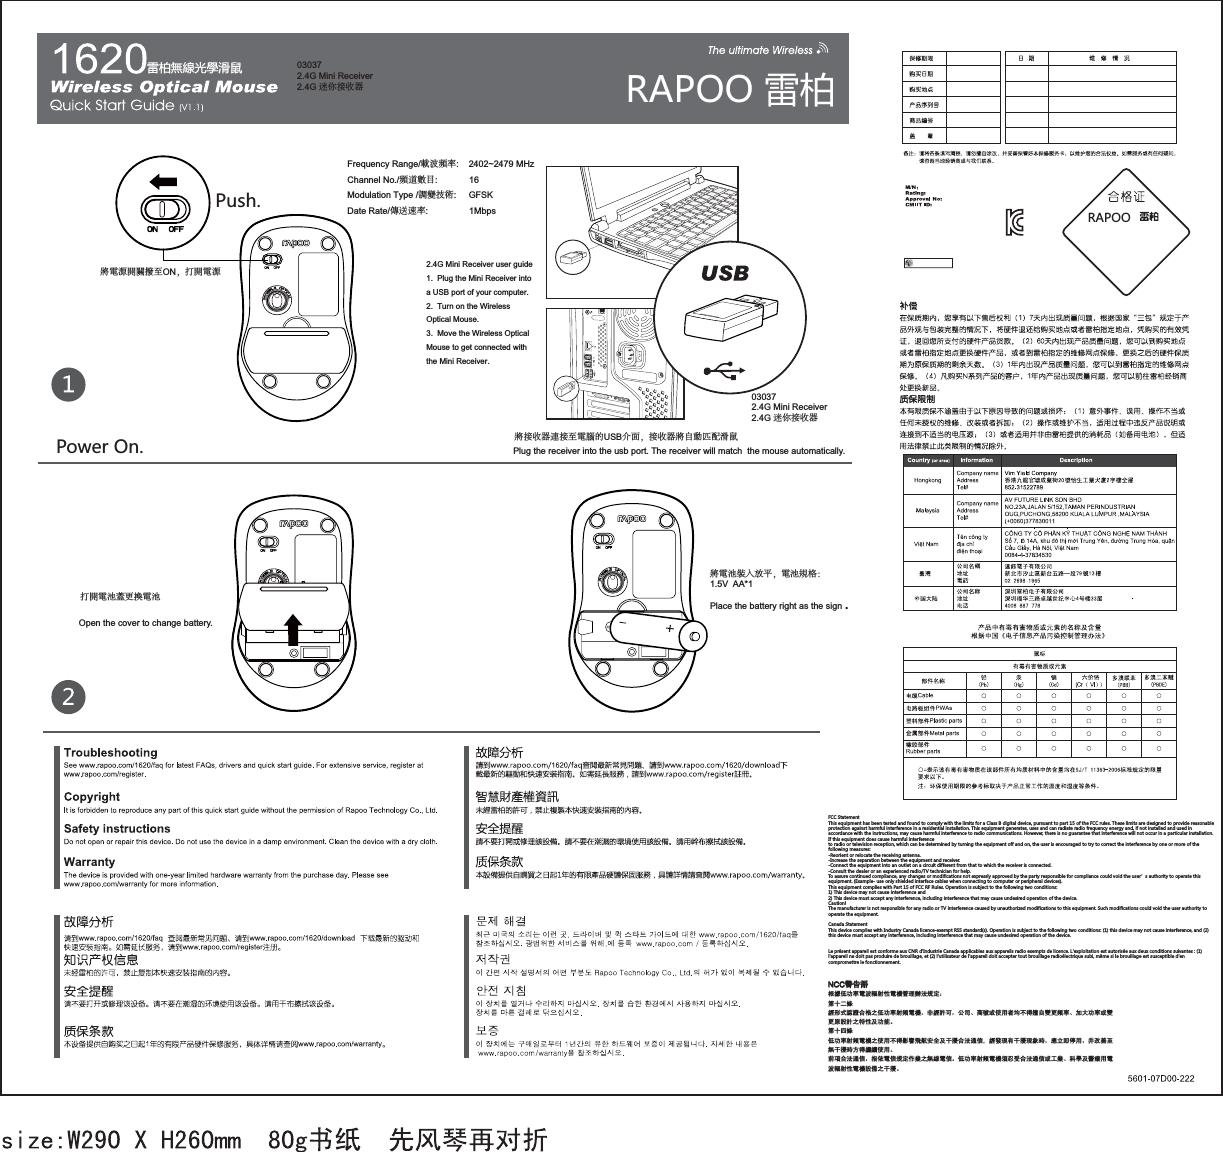 Rapoo Technology 03037I 2.4G Mini Receiver User Manual